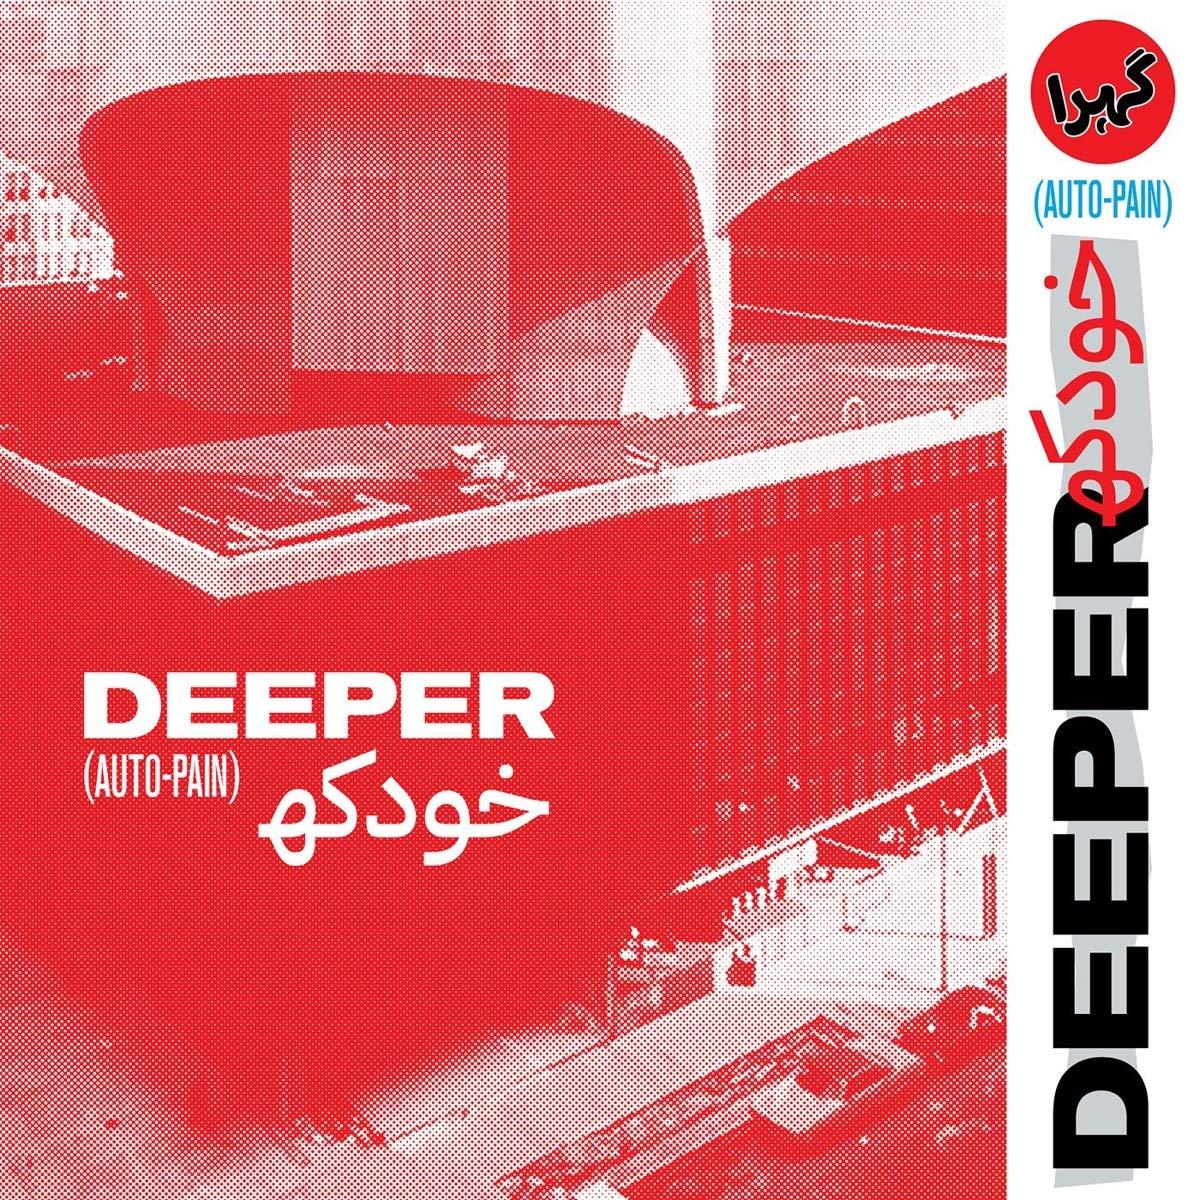 Buy Deeper ~ Auto-Pain New or Used via Amazon